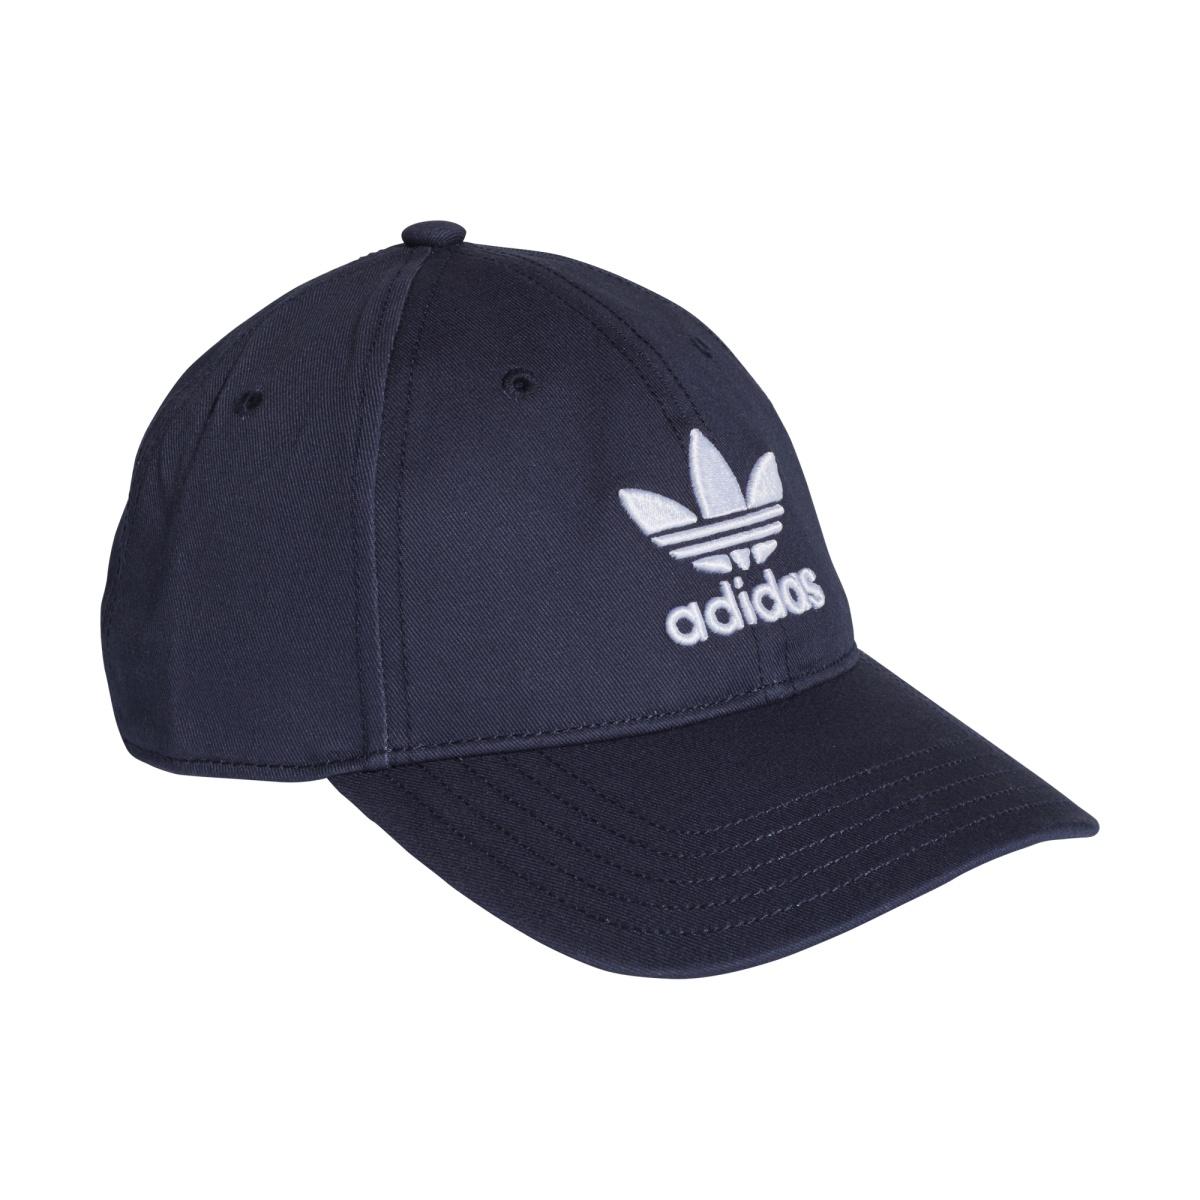 be66fcf7231 adidas Trefoil Cap modrá 58-60 - Glami.cz